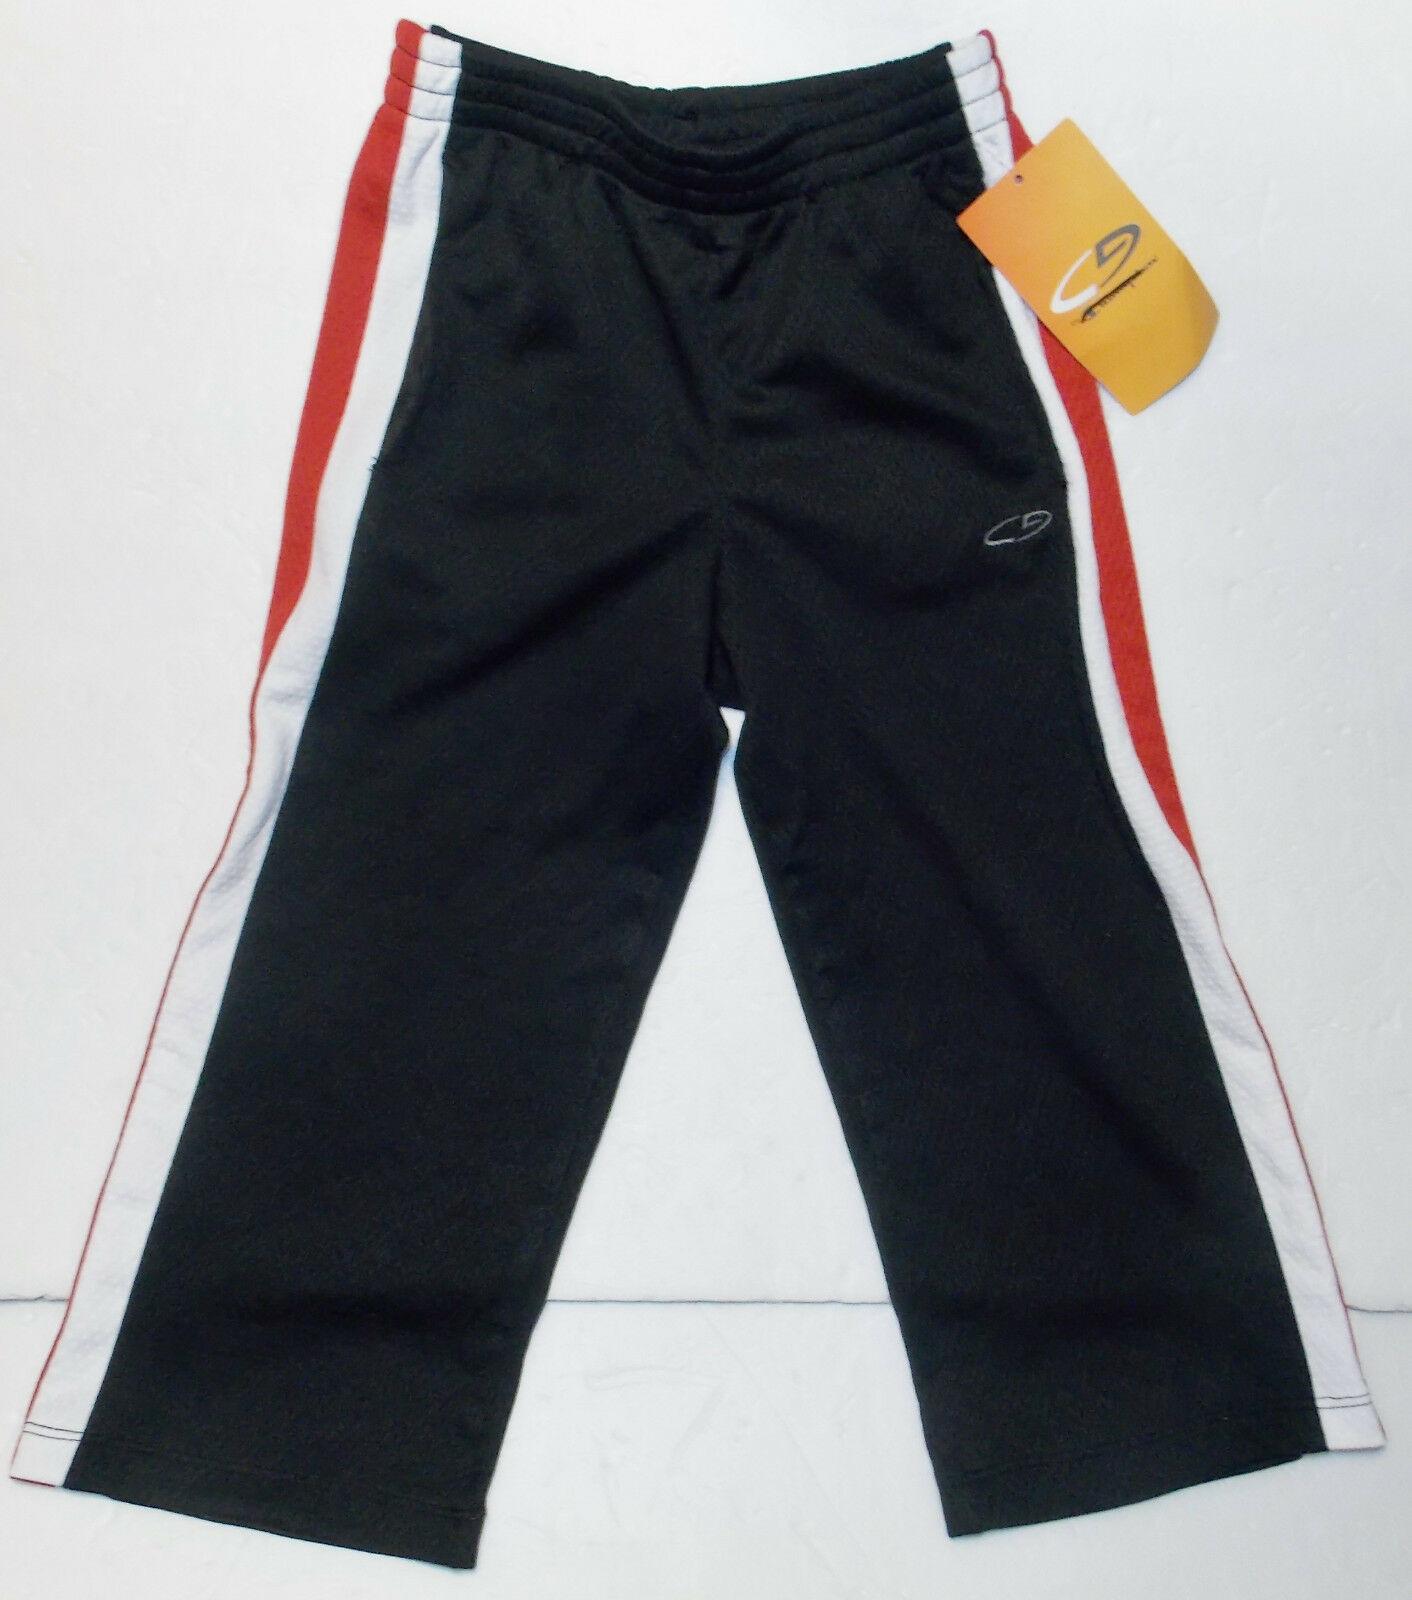 Cat /& Jack Skinny Flexible Drawsting Denim Shorts Size 3T NWT